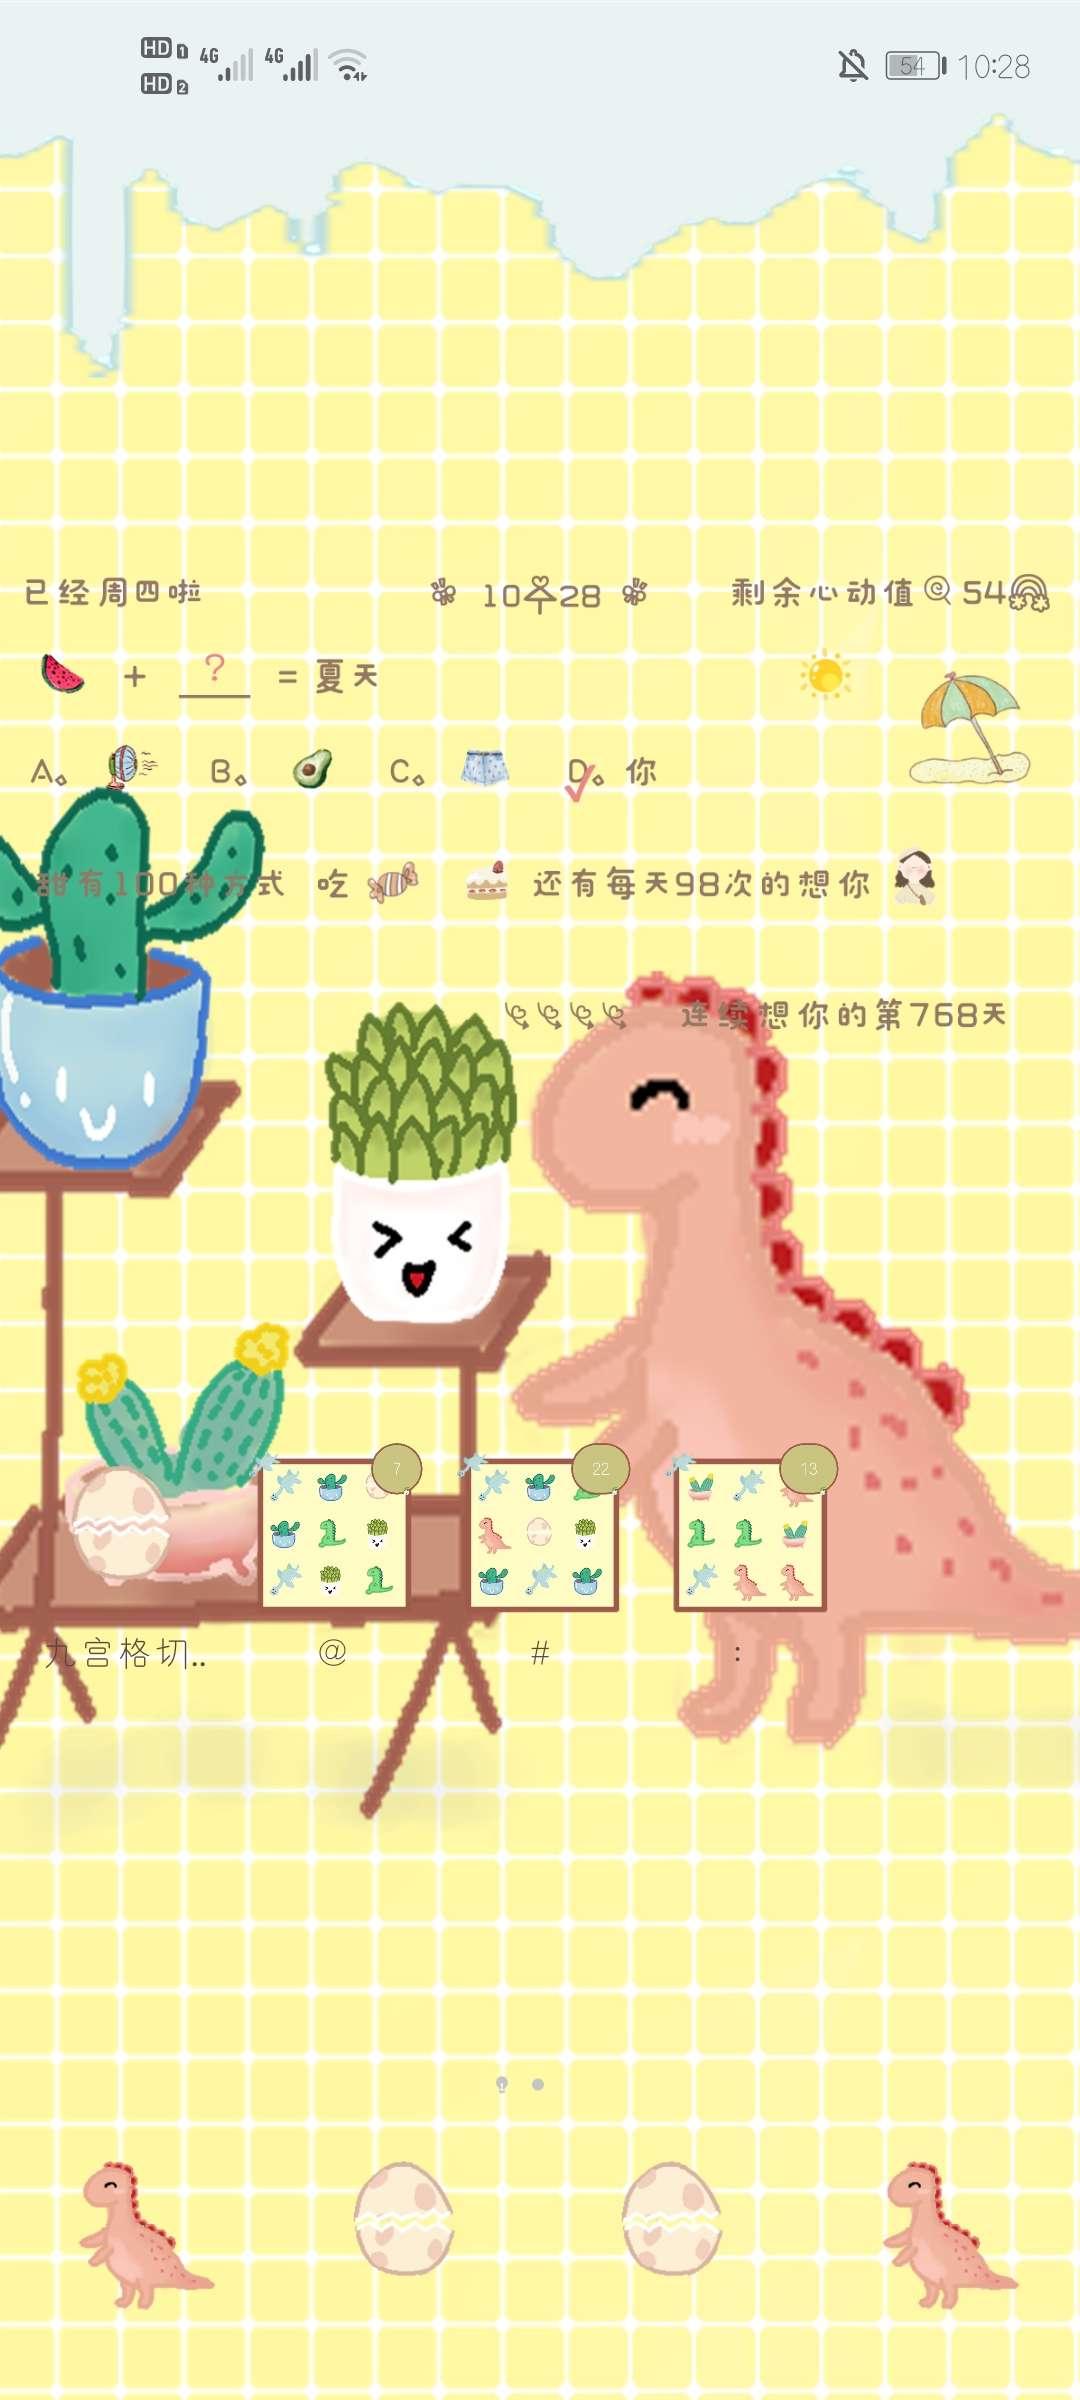 【Rain】华为可爱小主题 【小恐龙】-www.im86.com